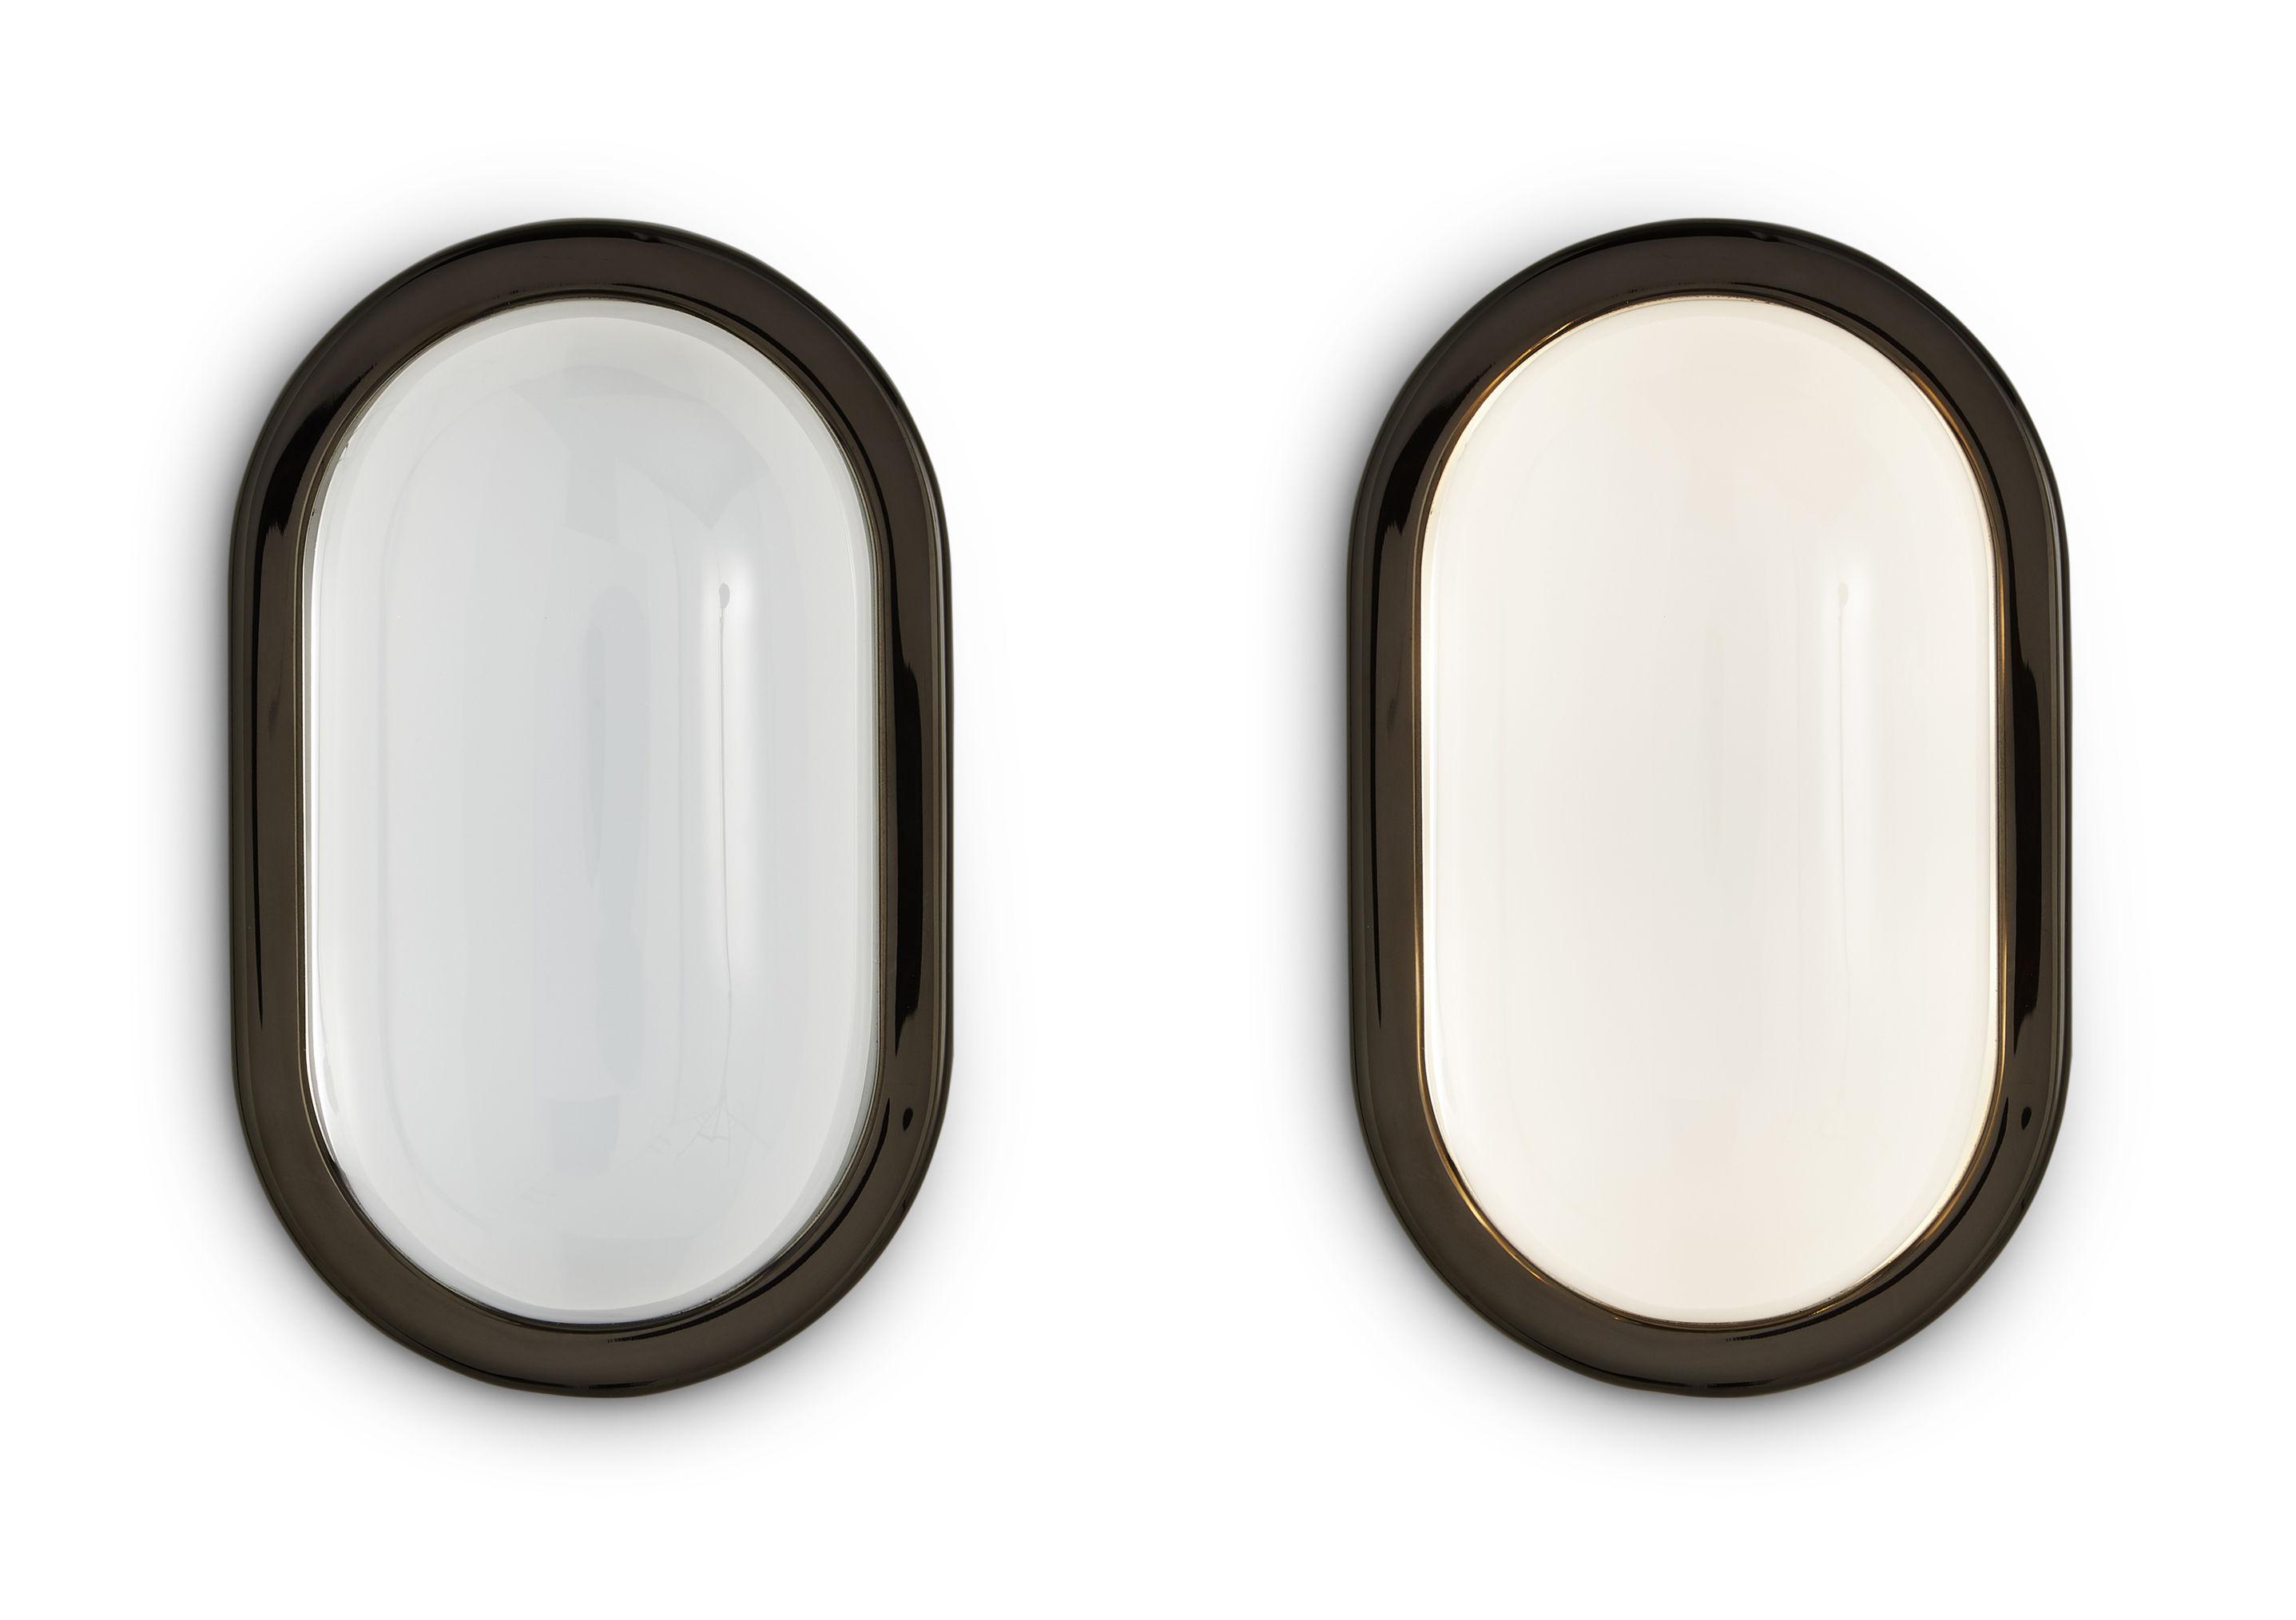 Applique spot tom dixon noir brillant l h made in design